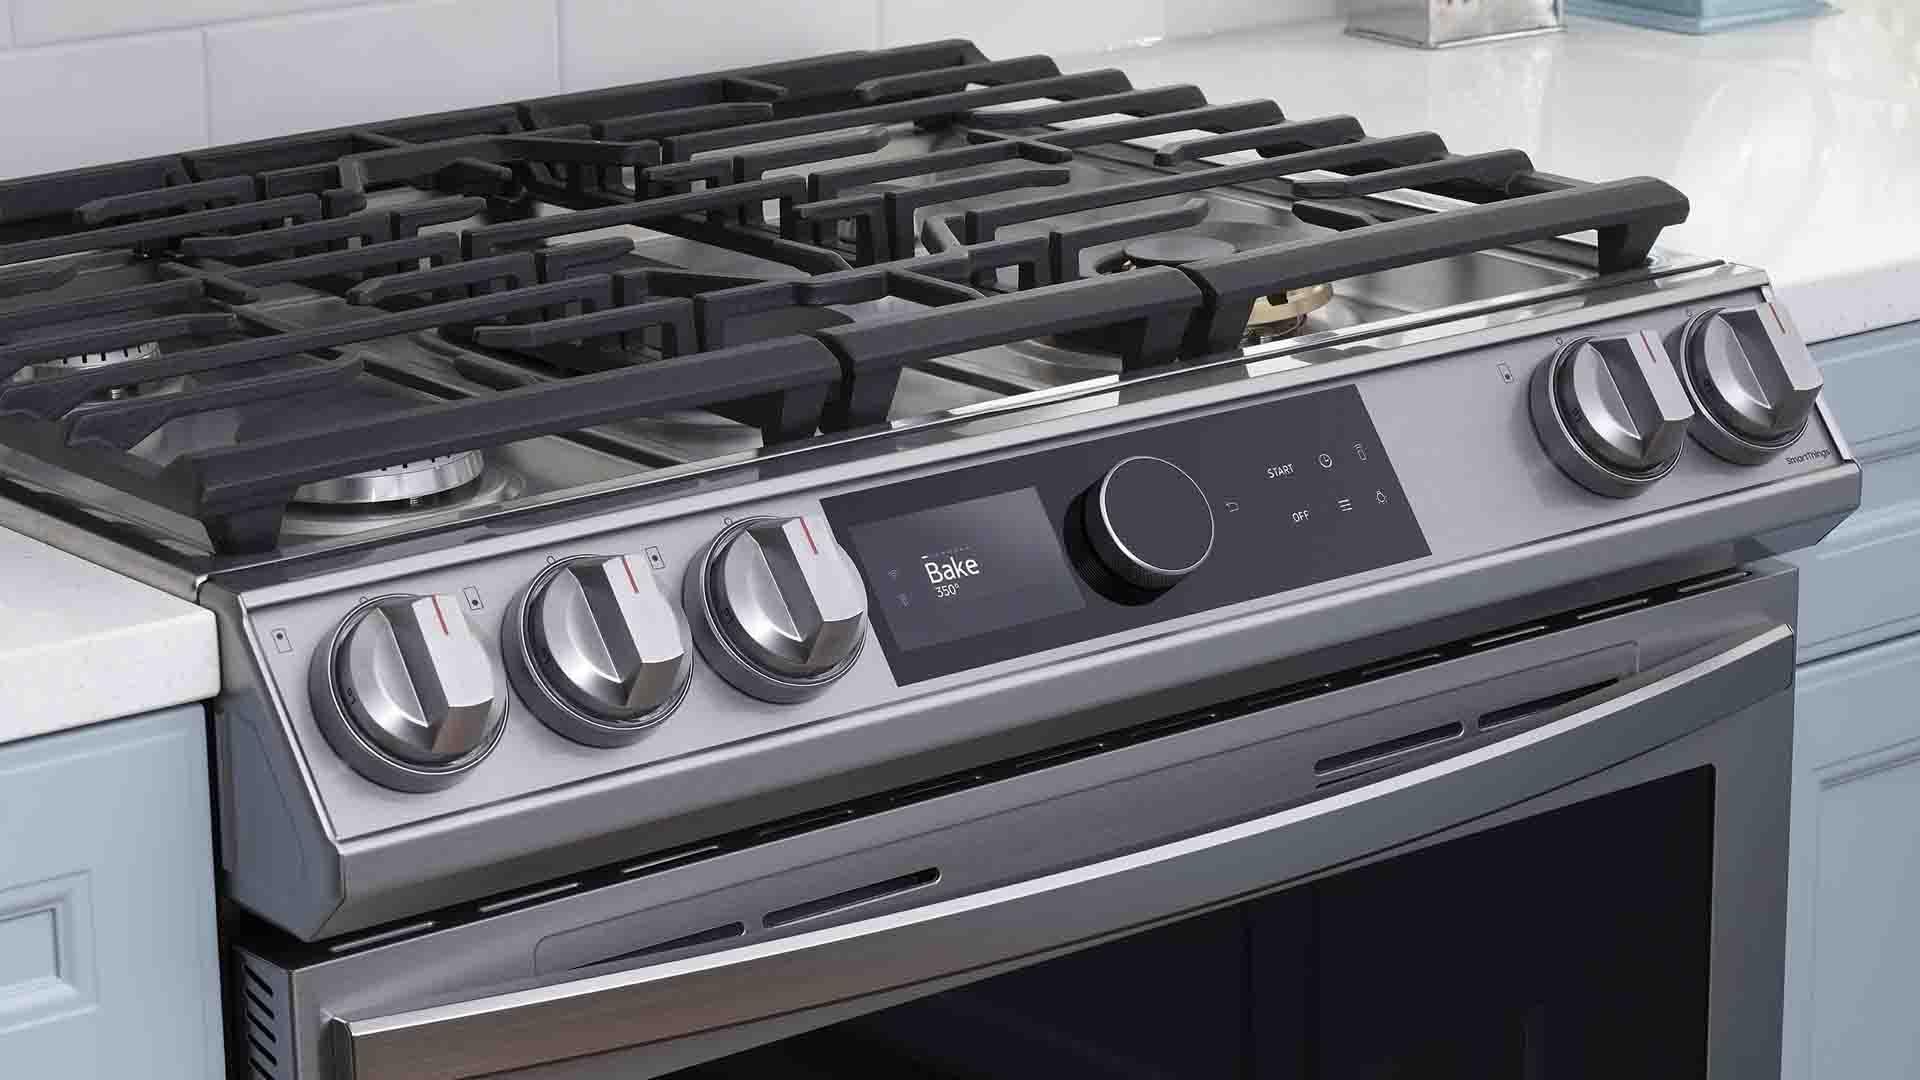 Samsung Ranges Appliance Refrigerator Service | Samsung Appliance Repairs